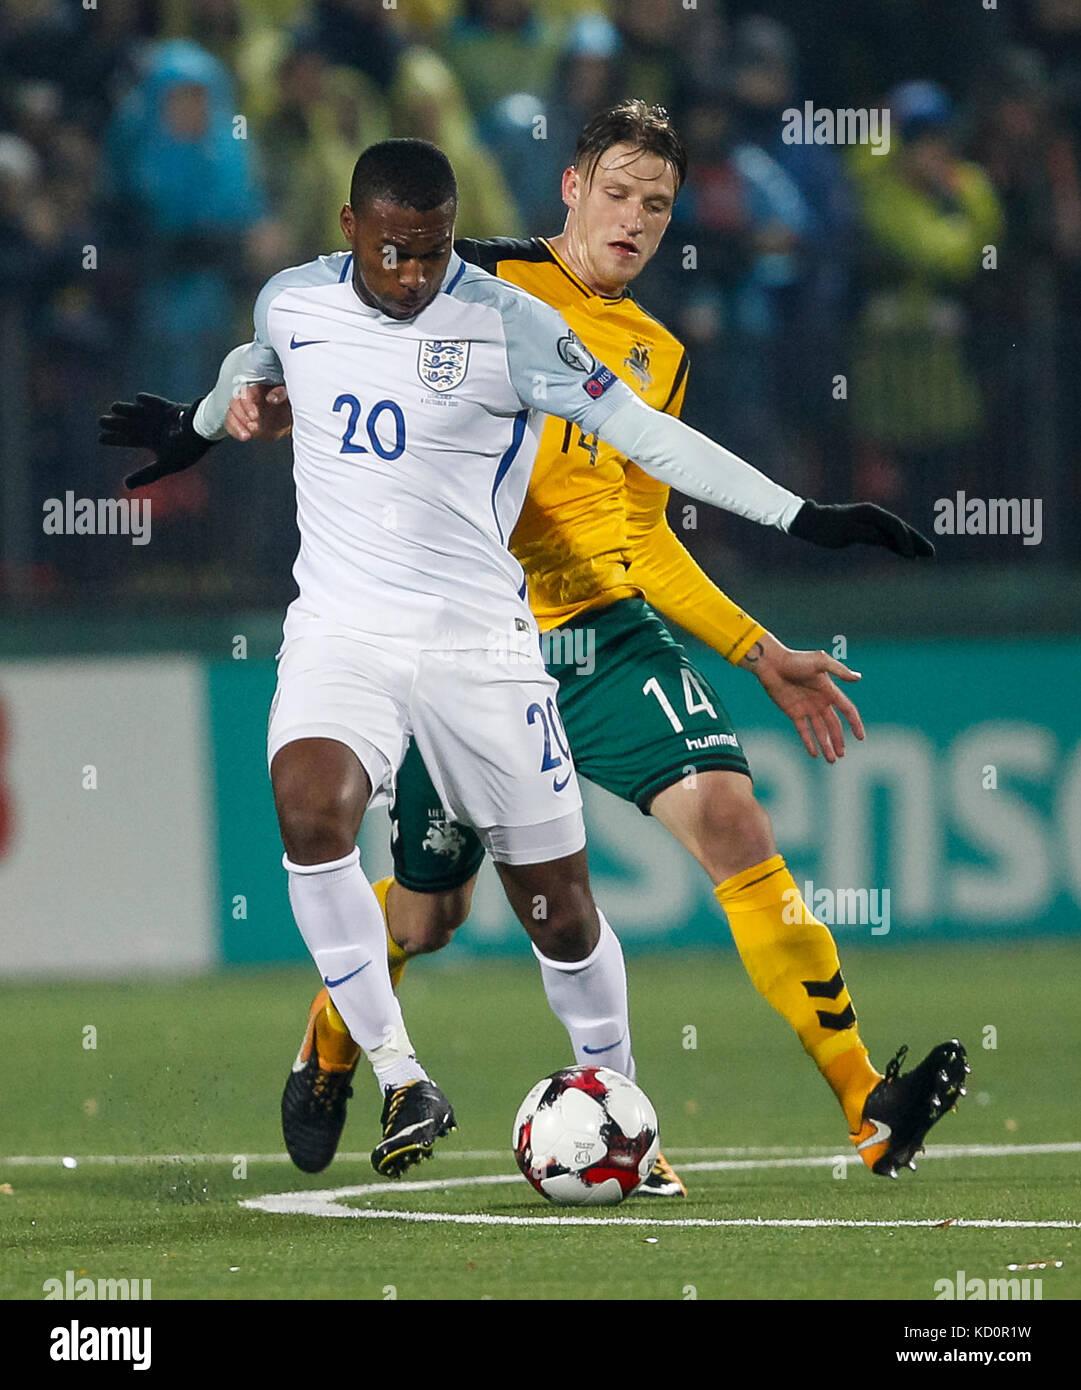 Vilnius, Lithuania. 8th Oct, 2017.  Daniel Sturridge of England and Vykintas Slivka of Lithuania during the FIFA - Stock Image